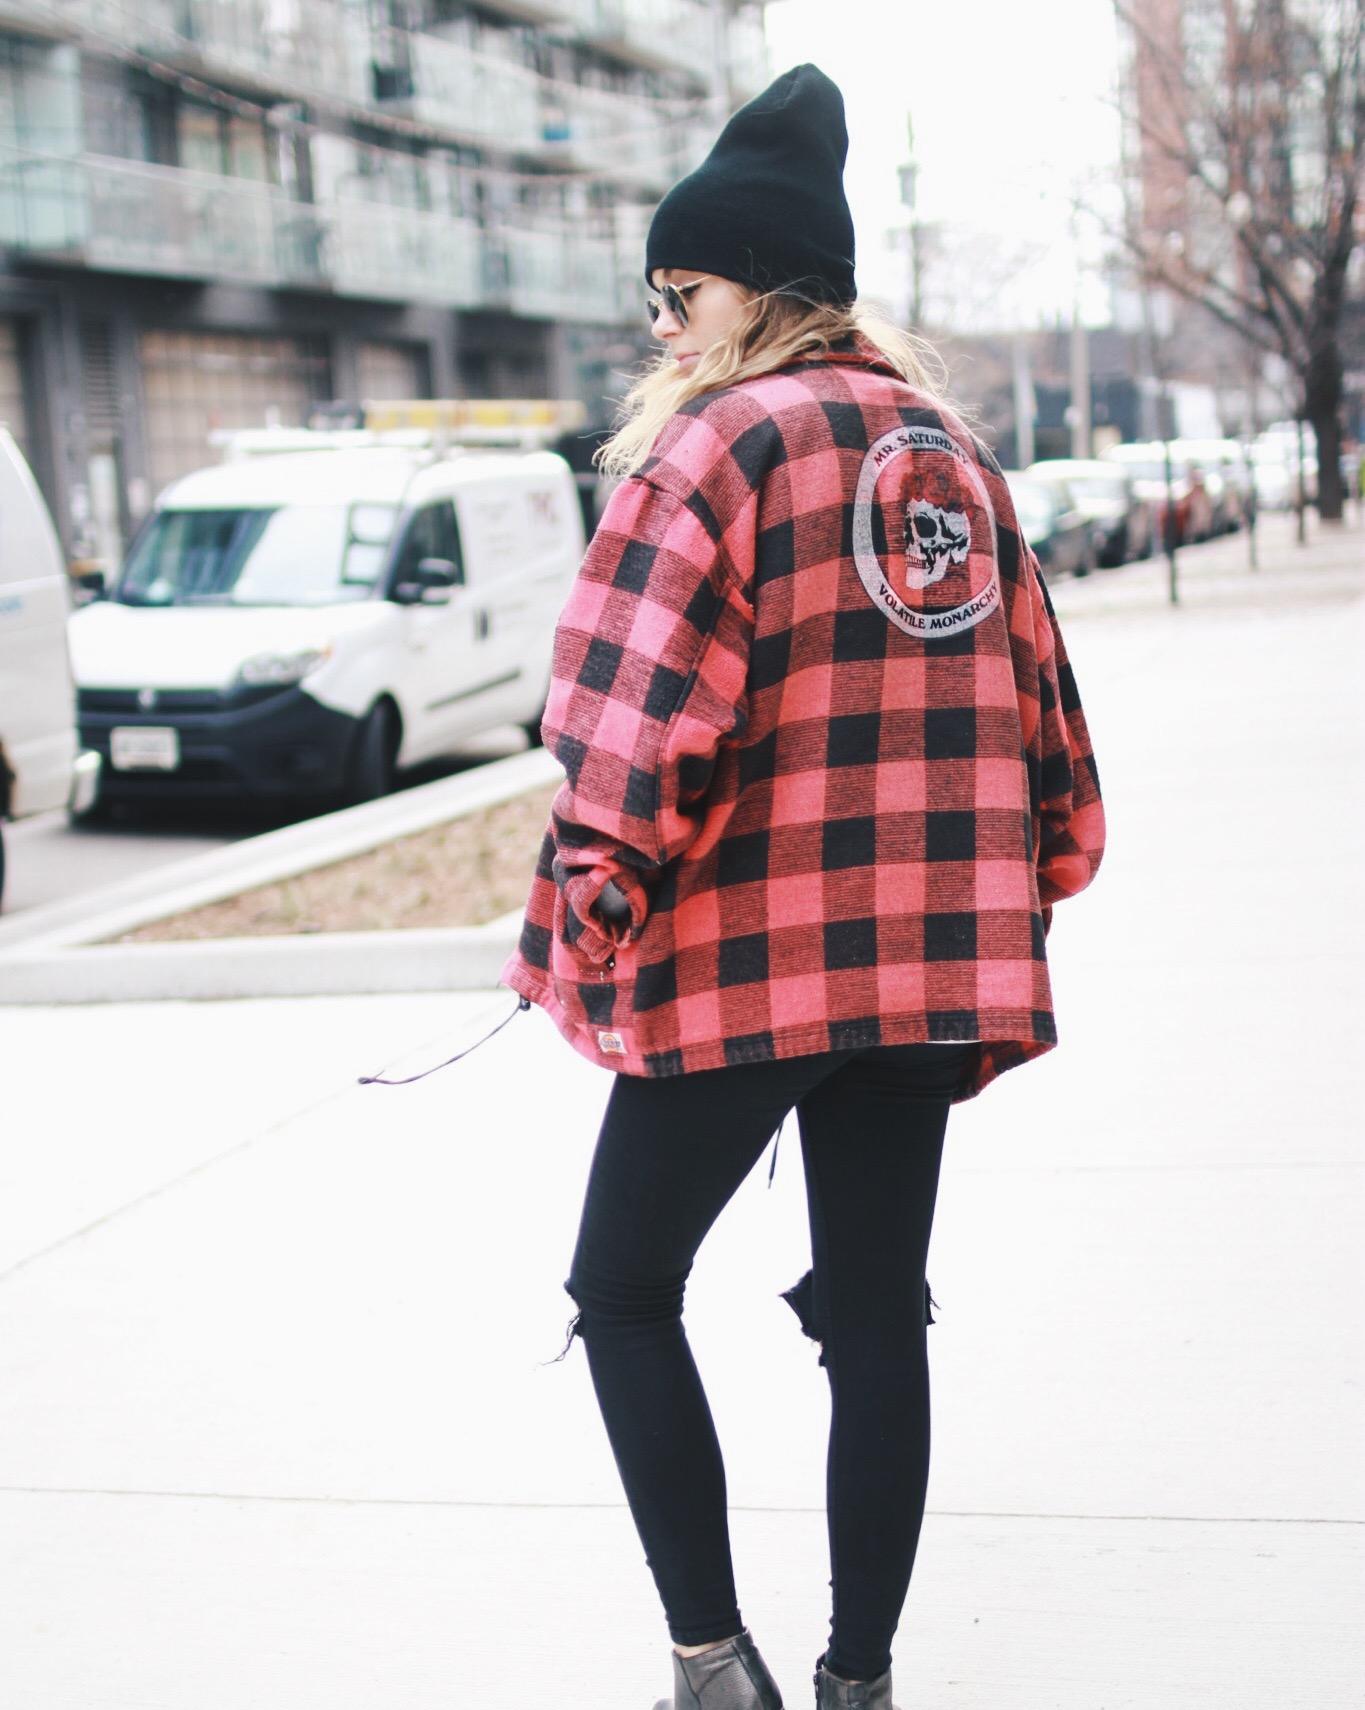 Coat: Mr. Saturday, Sweatshirt: Boohoo, Undershirt: Glad Rags, Pants: TopShop, Boots: Aldo, Hat: Raising the Roof, Sunglasses: RayBan